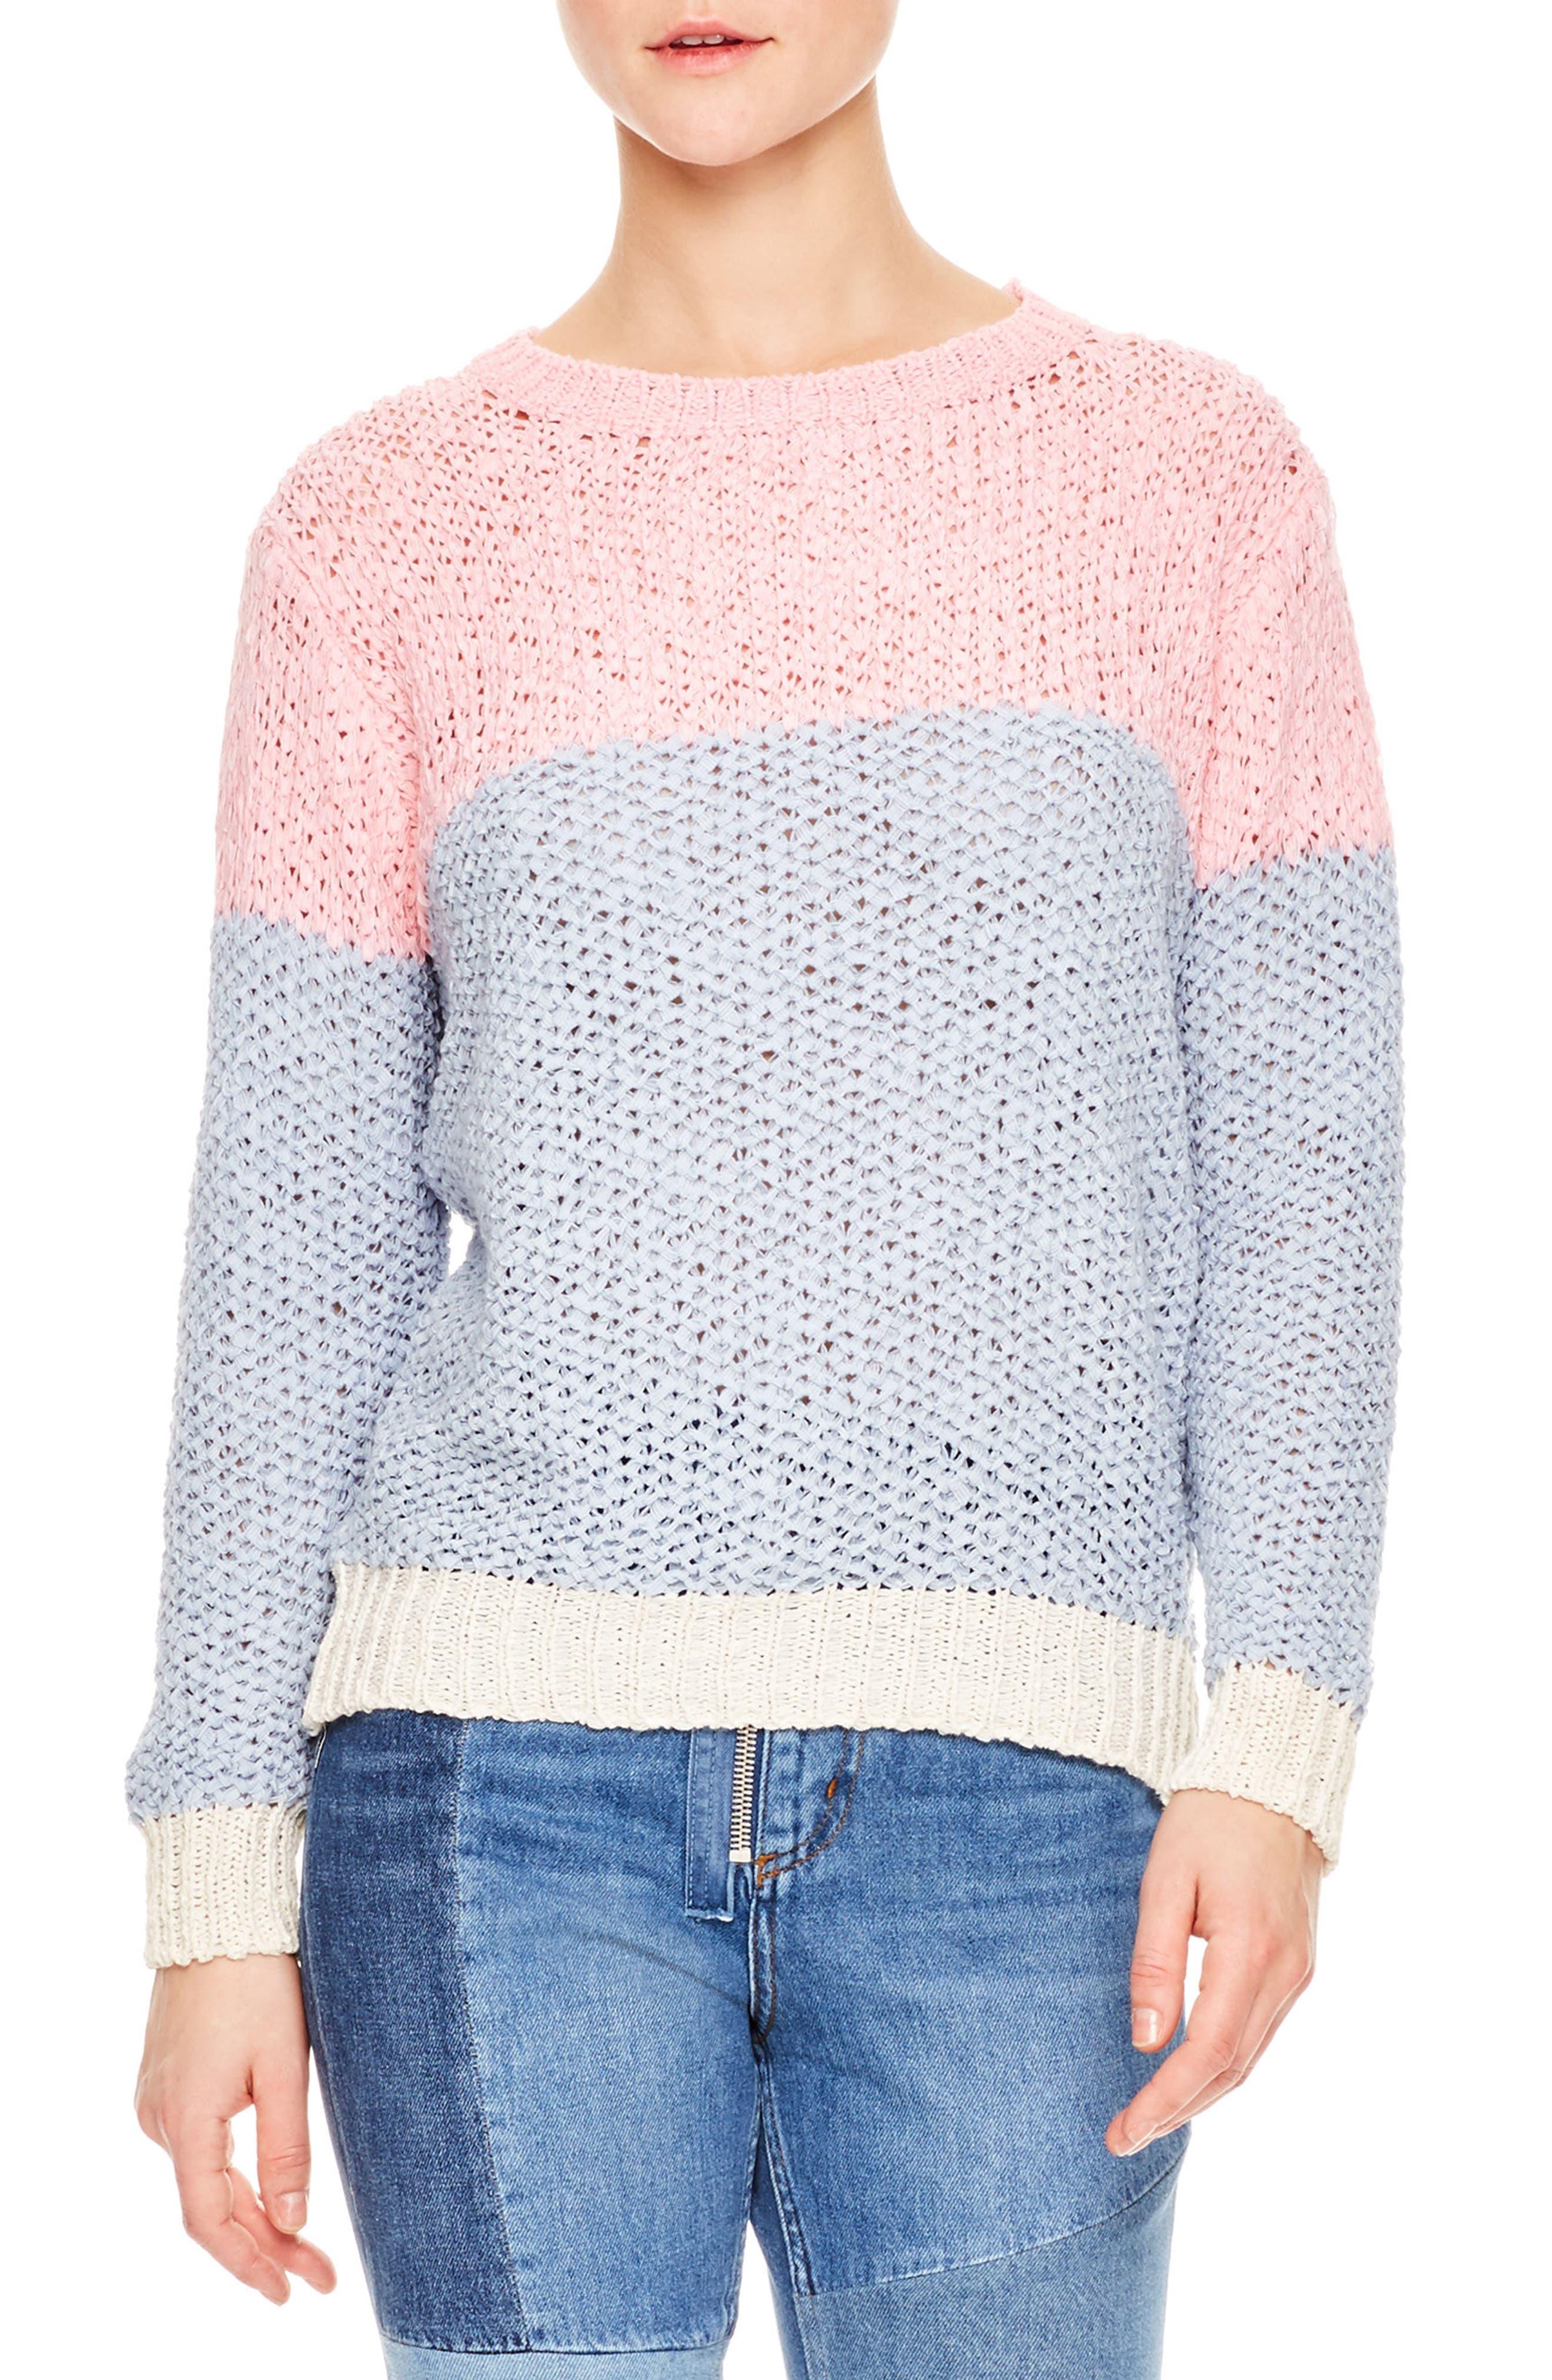 Malabar Colorblock Knit Sweater,                             Main thumbnail 1, color,                             650